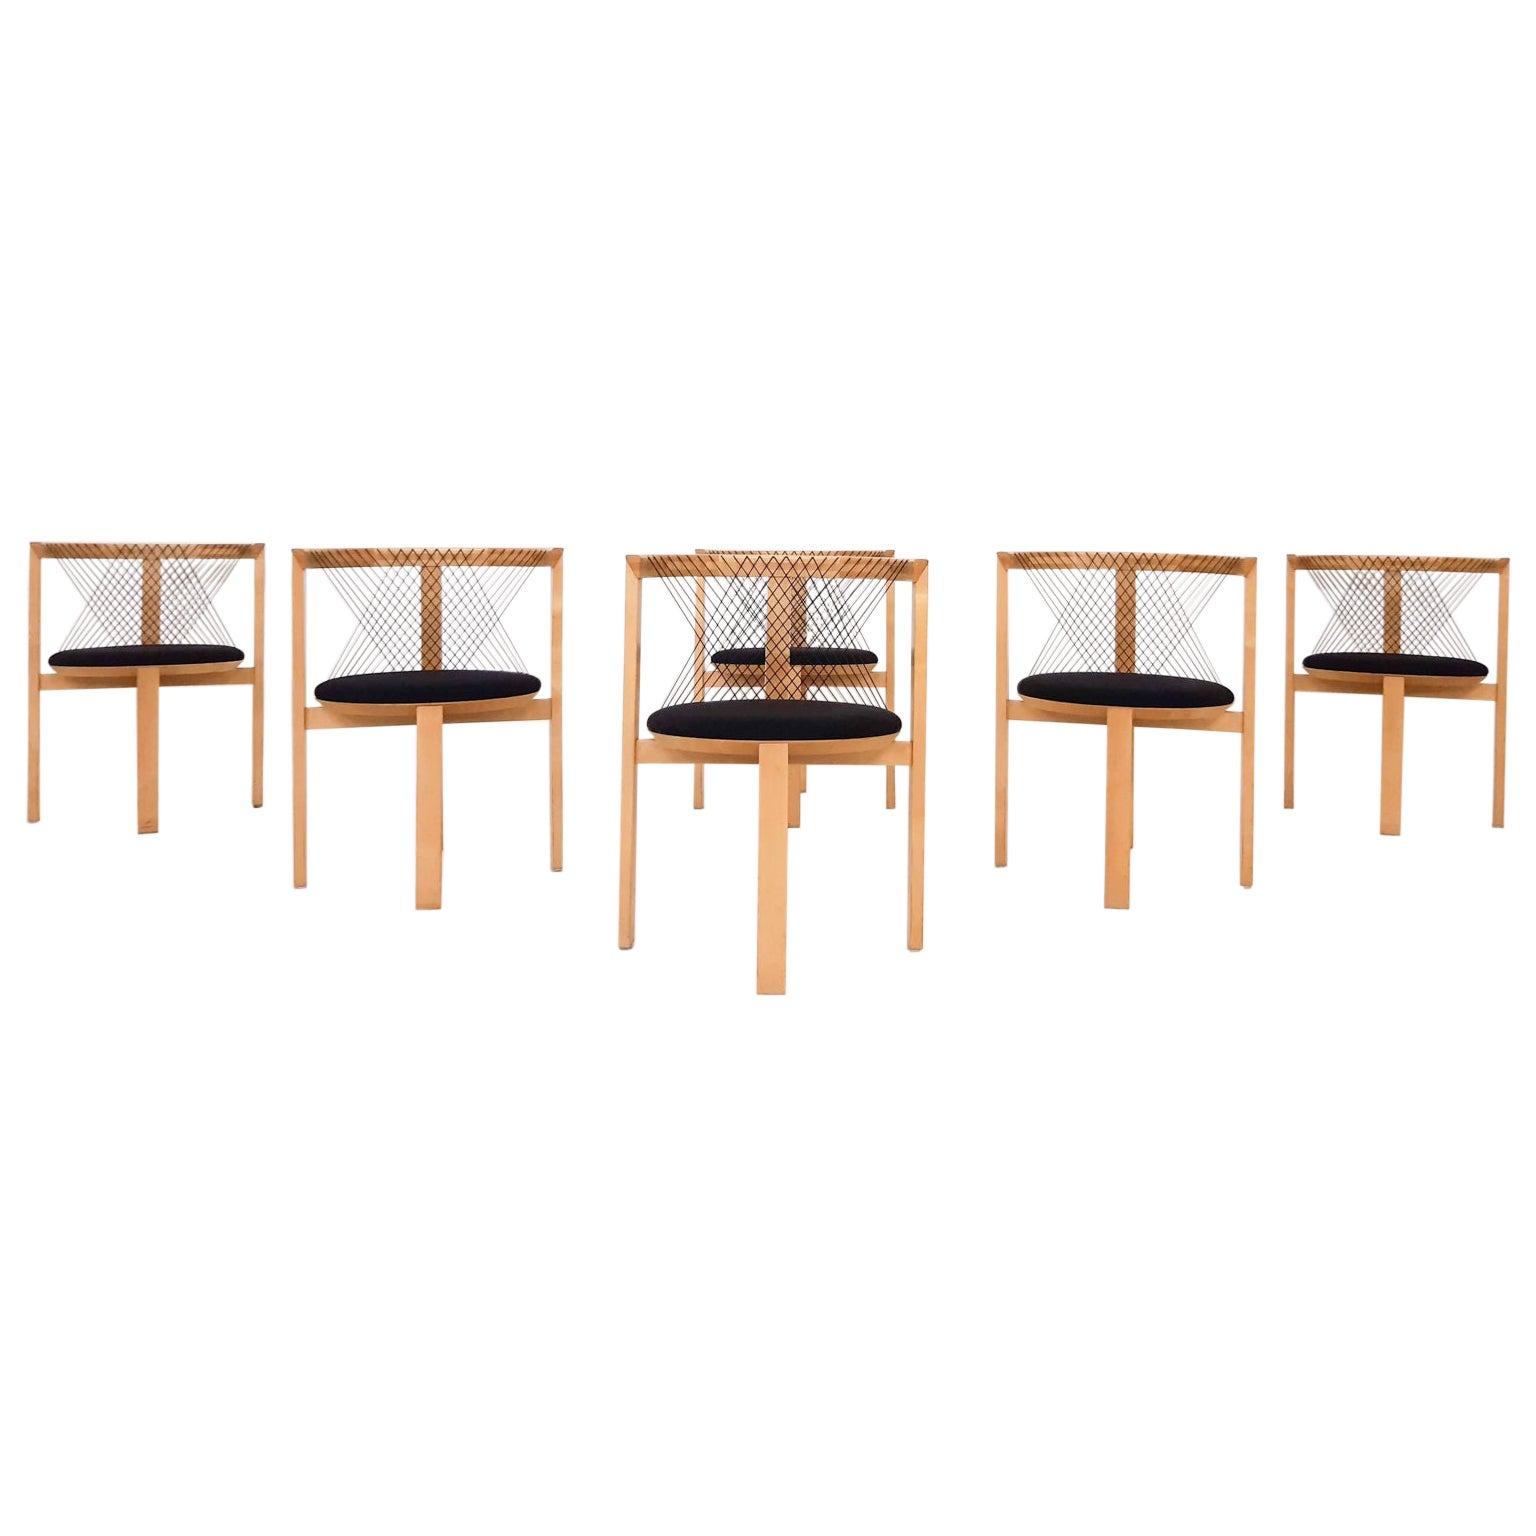 "Set of 6 Niels Jorgen Haugesen for Tranekaer ""String"" Chairs, Denmark, 1995"